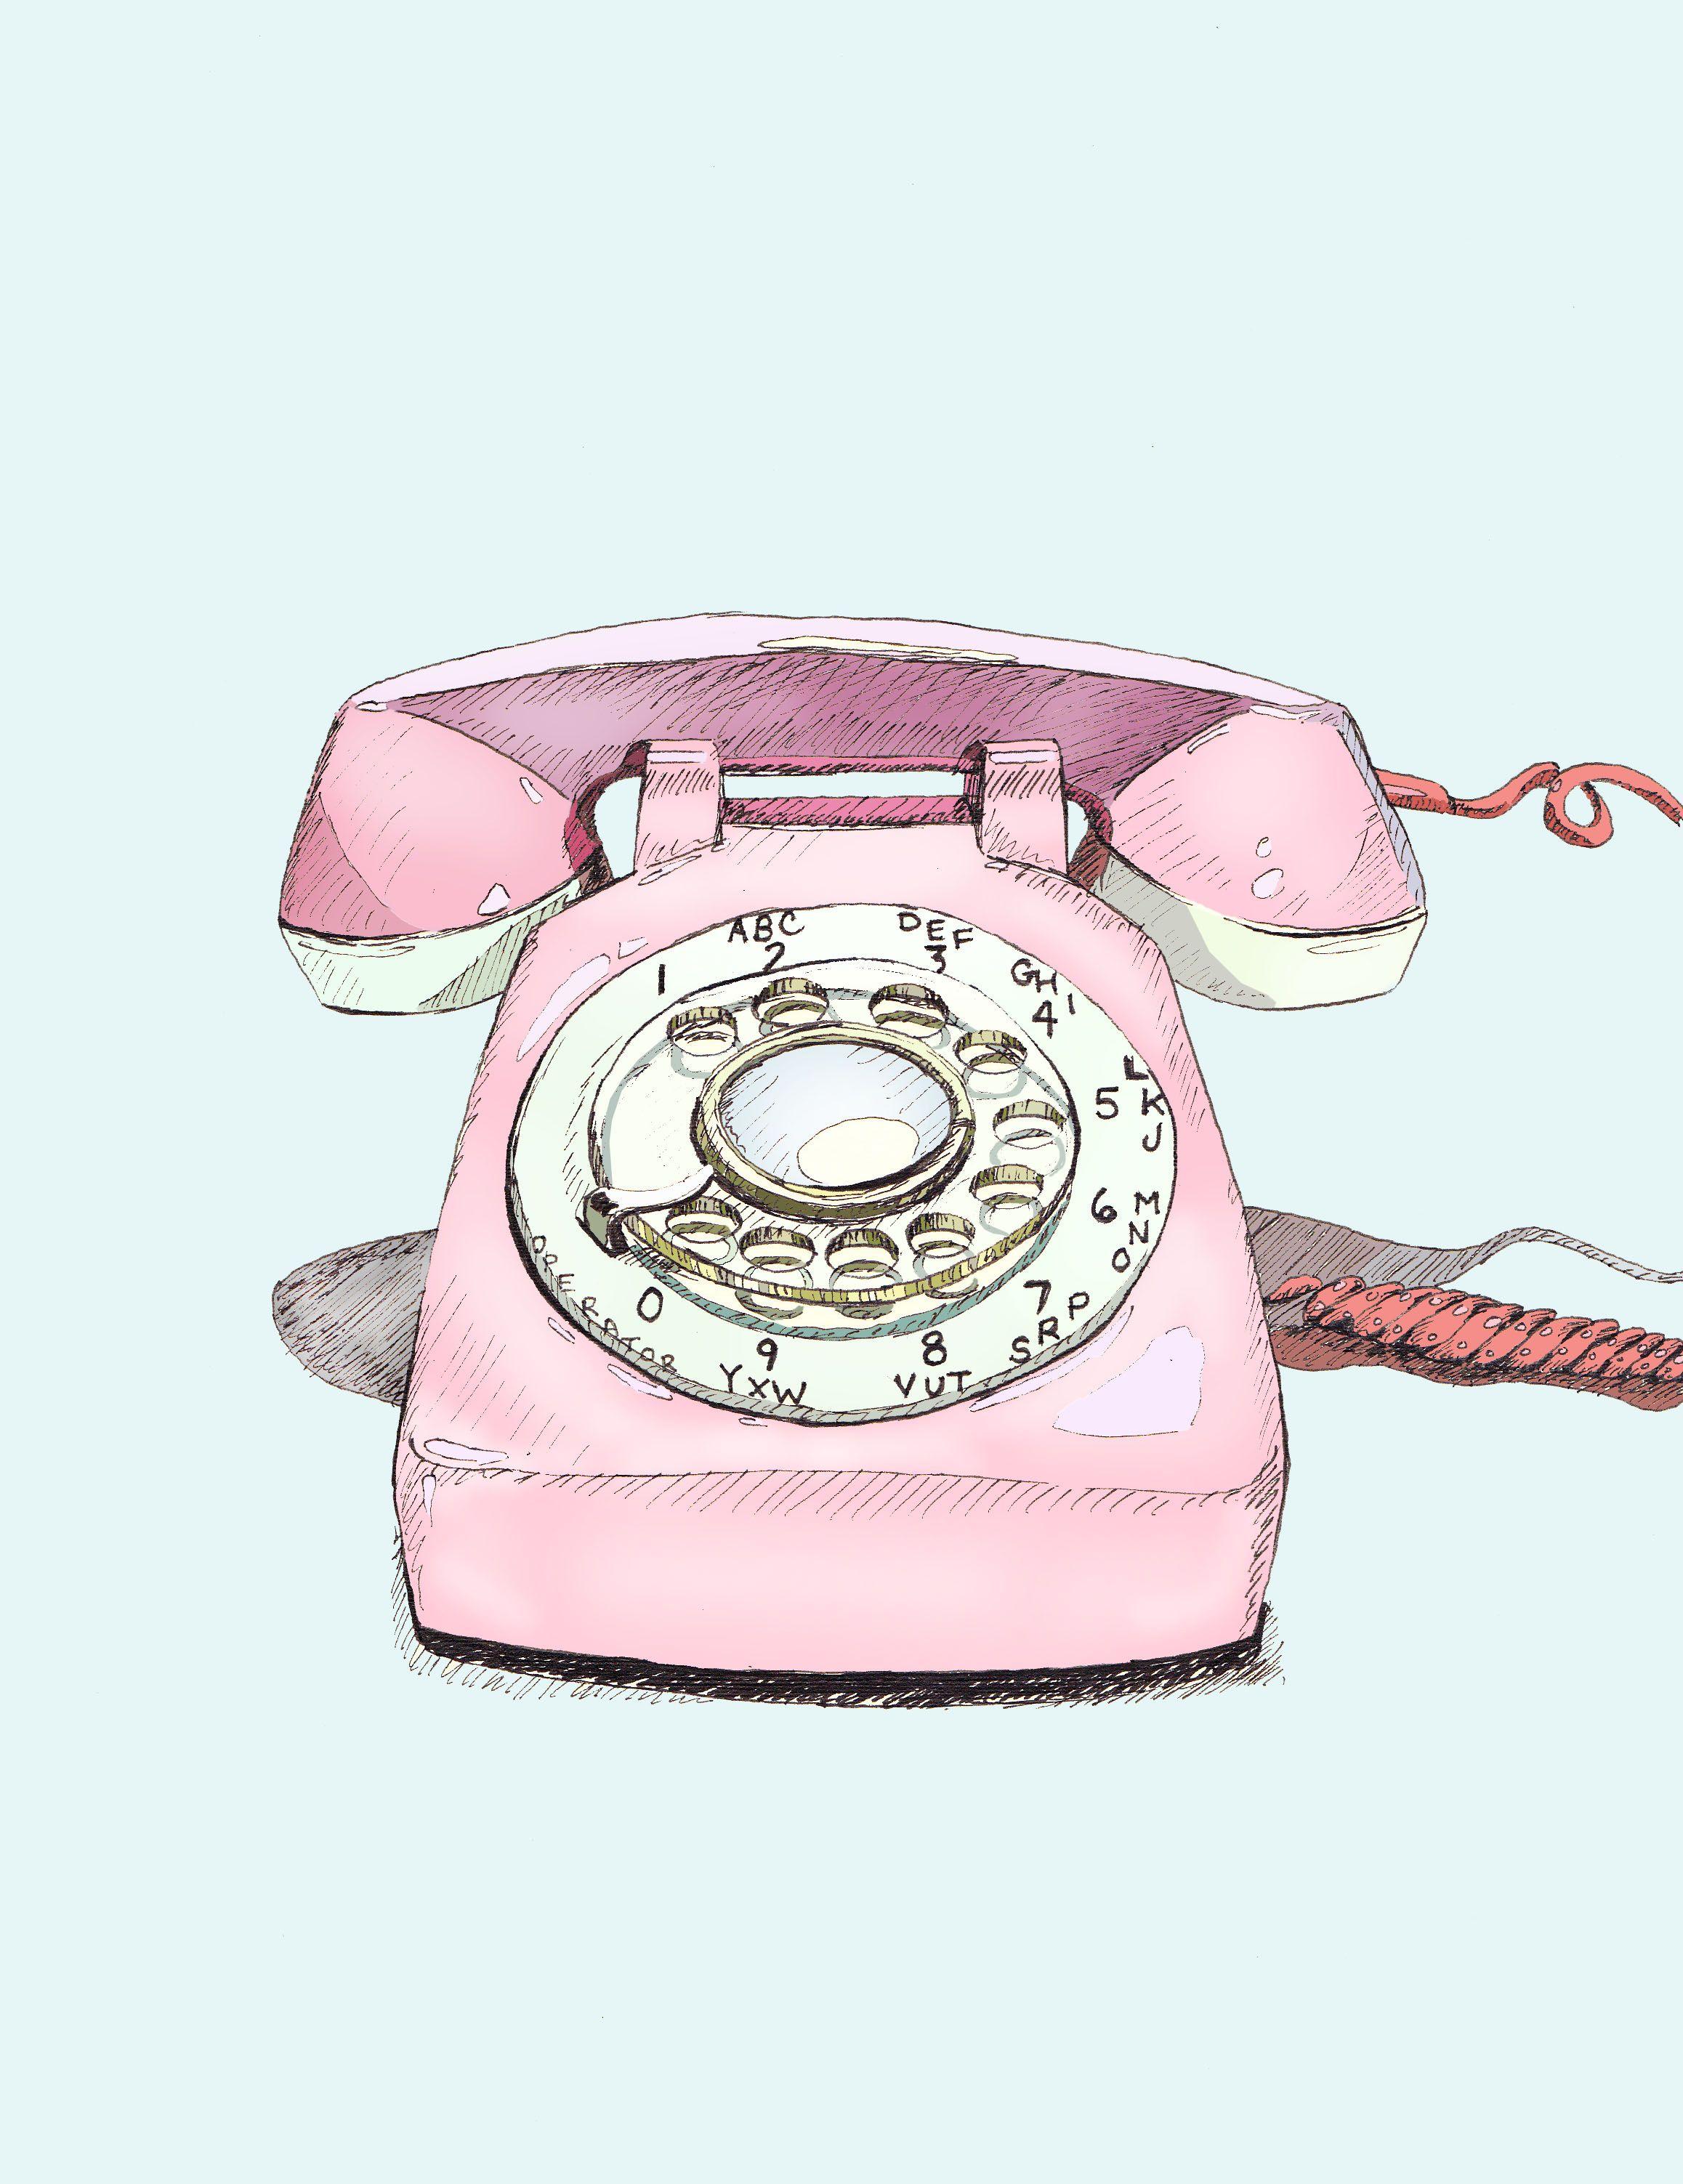 Rotary Phone By Foster Cranz Me Rotary Phone Phone Art Phone